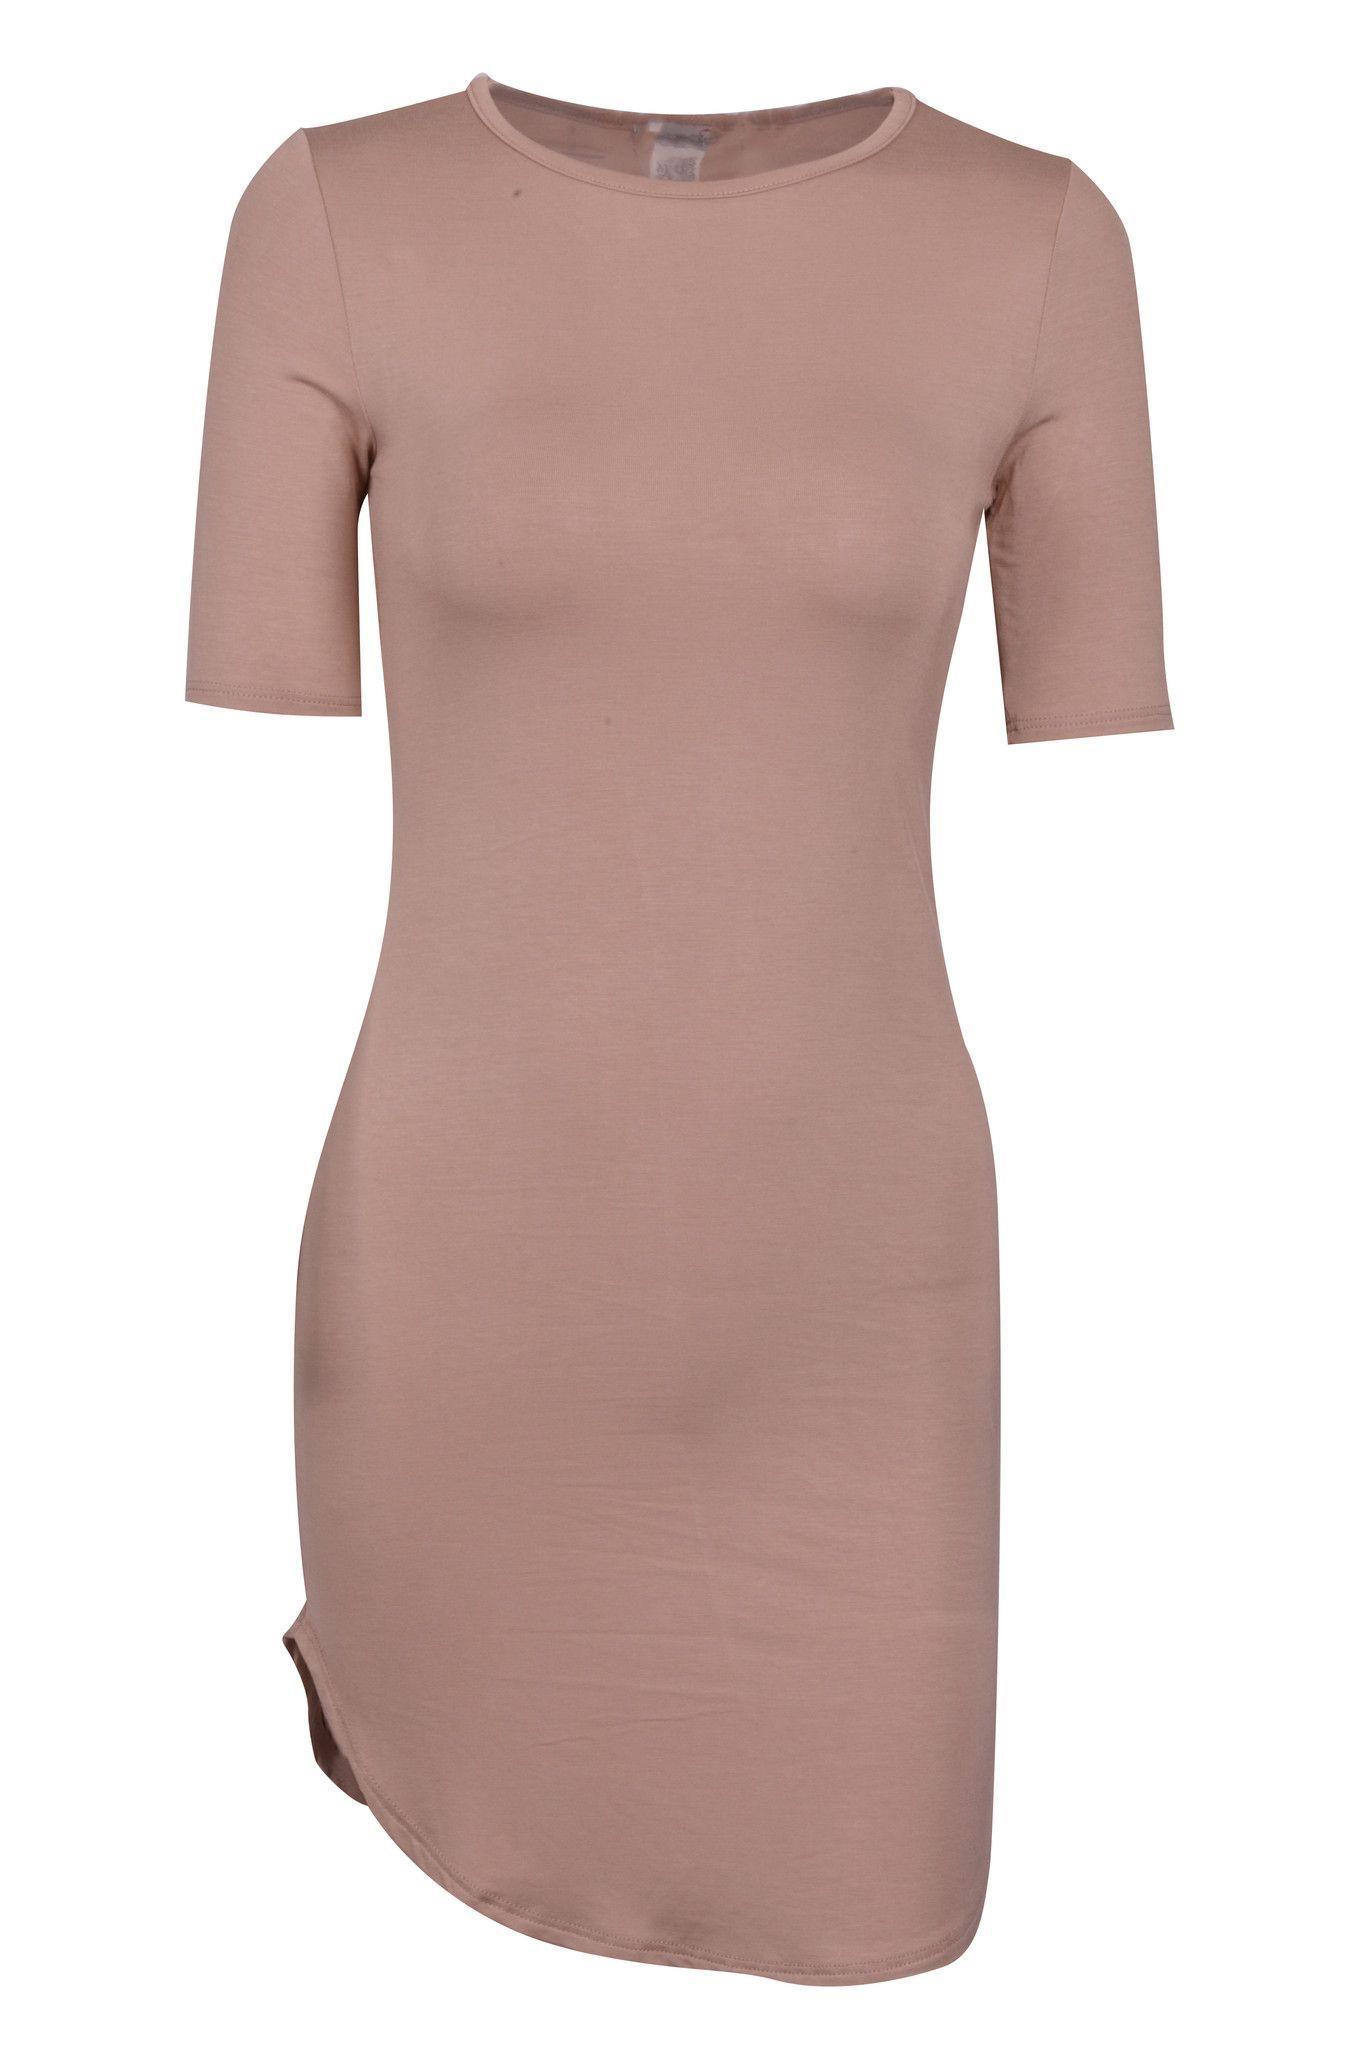 Sexy Round Neck 3/4 Sleeve Crescent Hem Bodycon Mini Dress